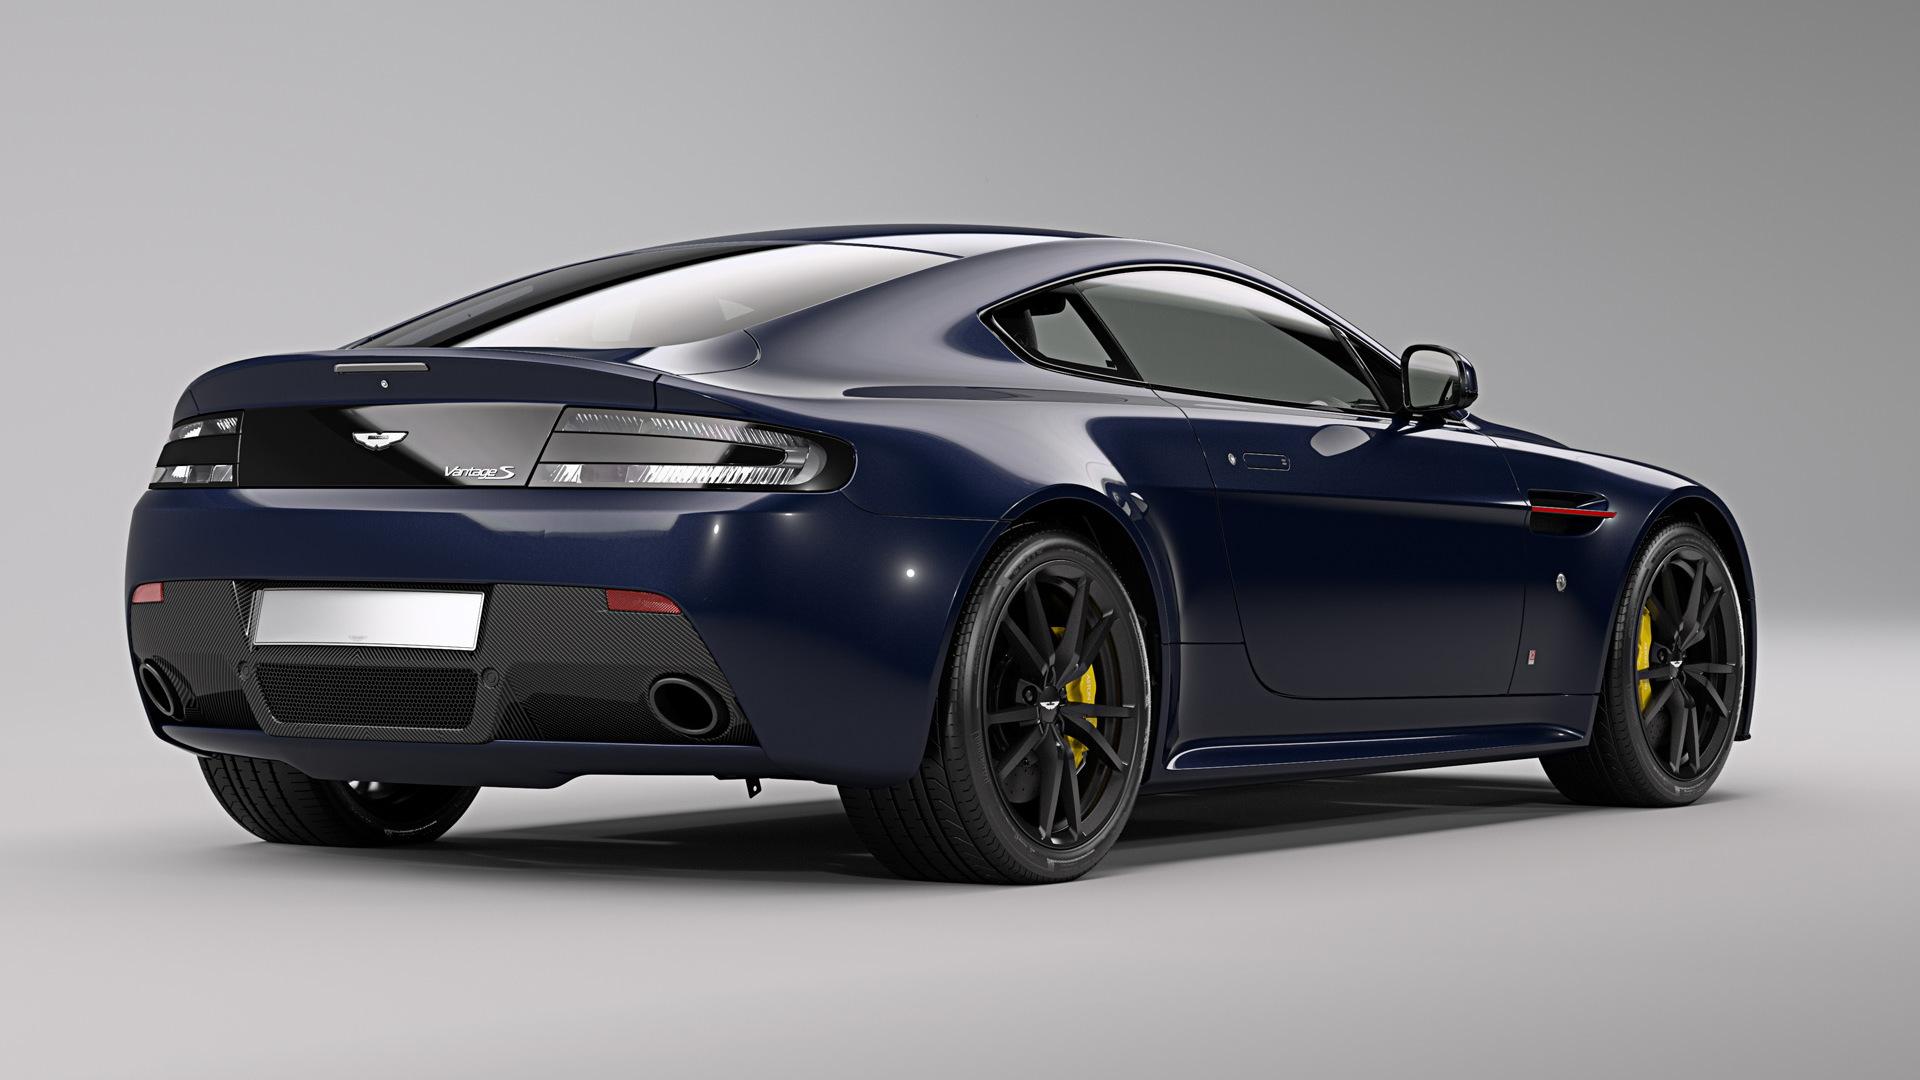 2017 Aston Martin Vantage Red Bull Racing Edition